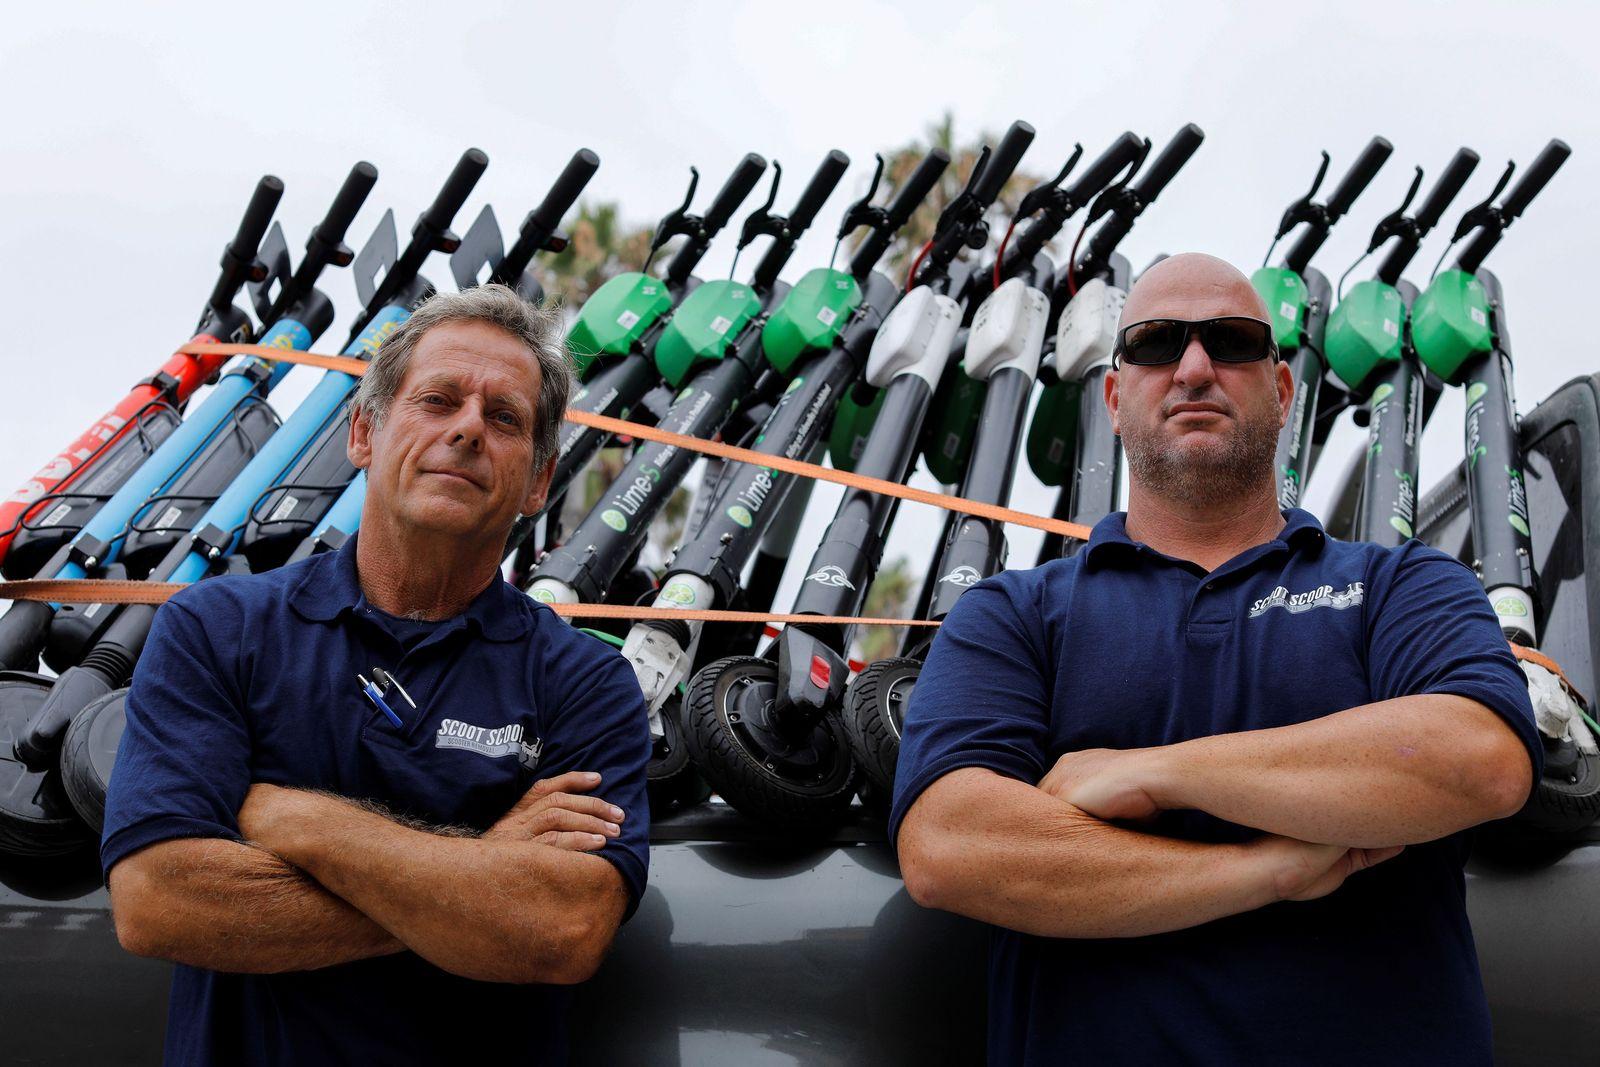 Scoot Scoop founders John Heinkel and Dan Borelli